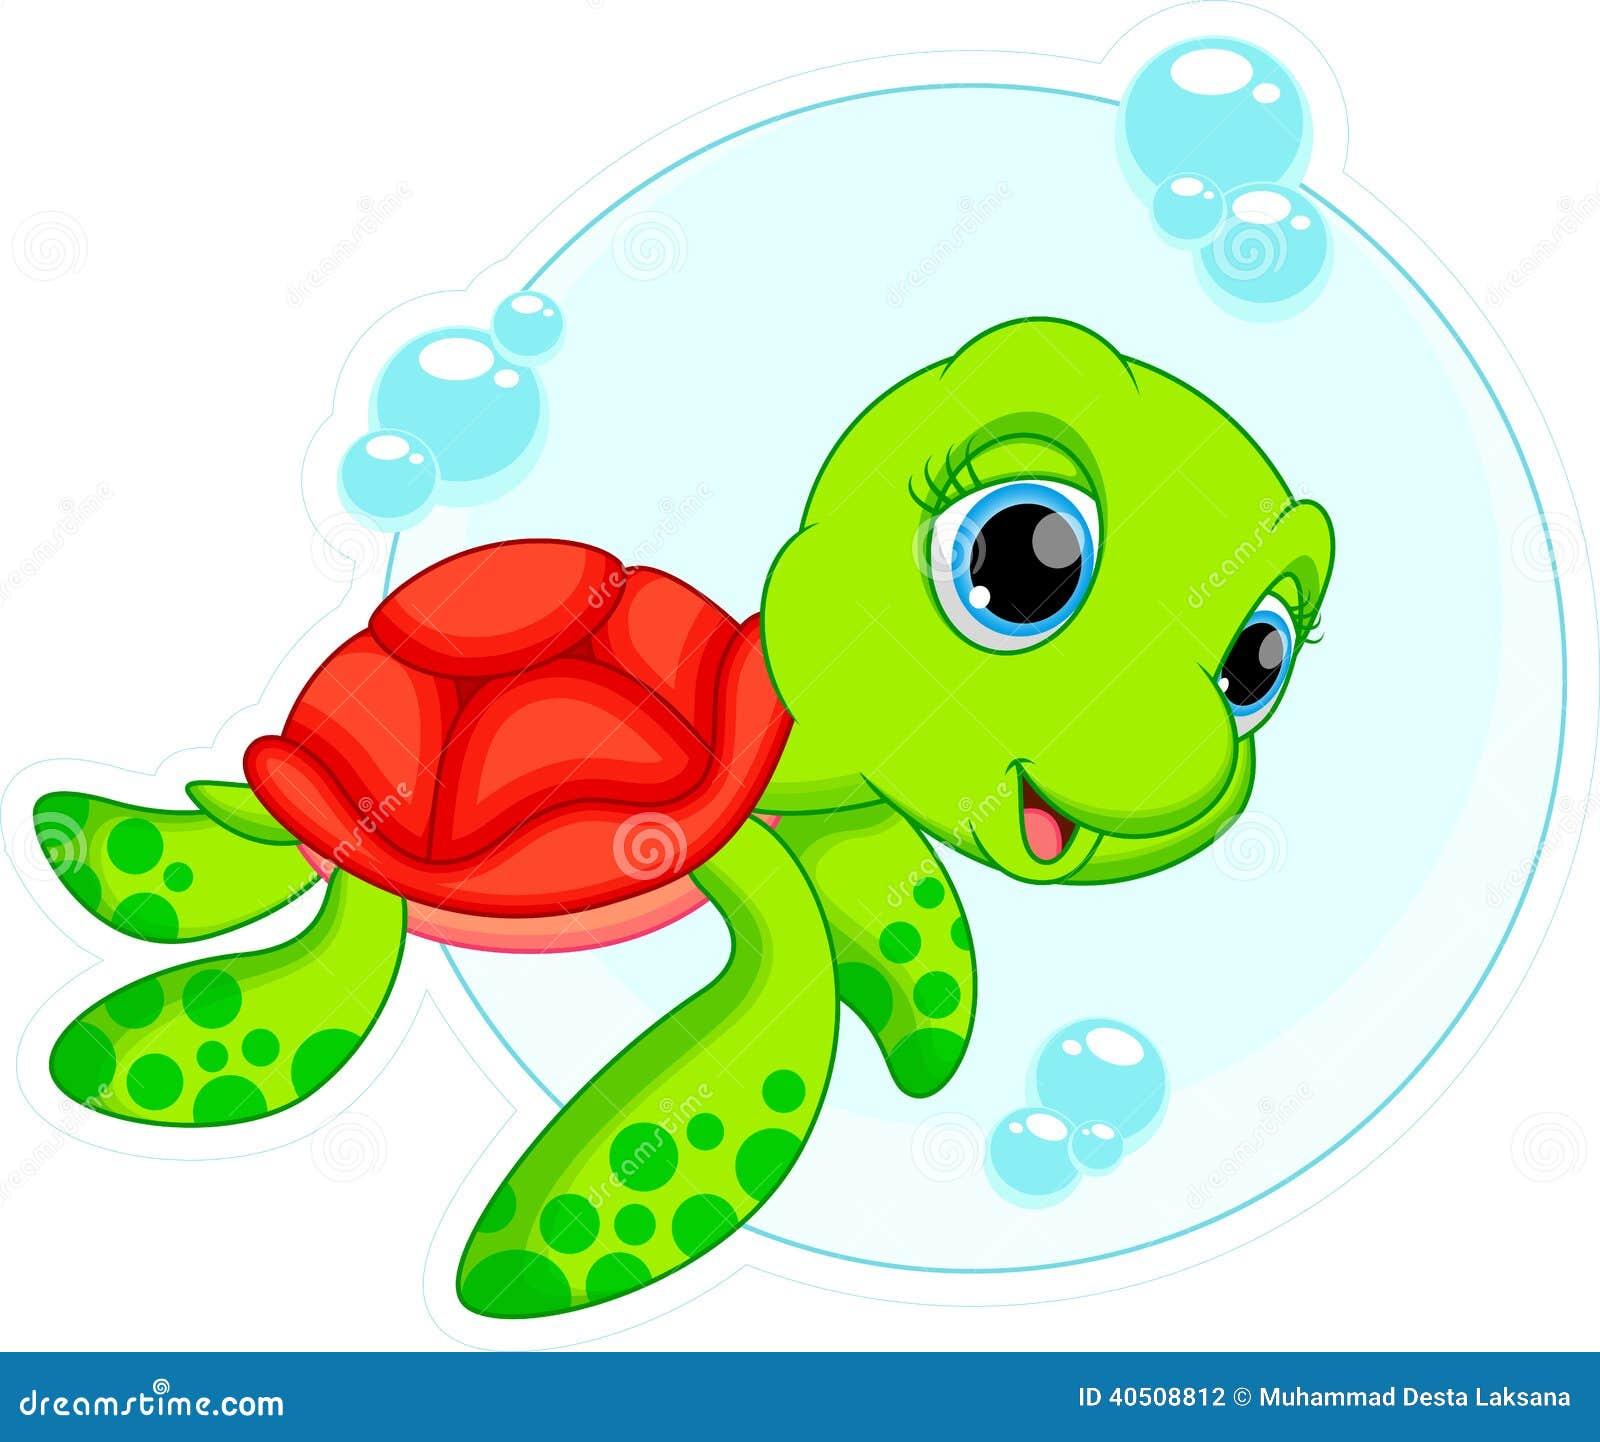 Cute animated sea turtles - photo#11